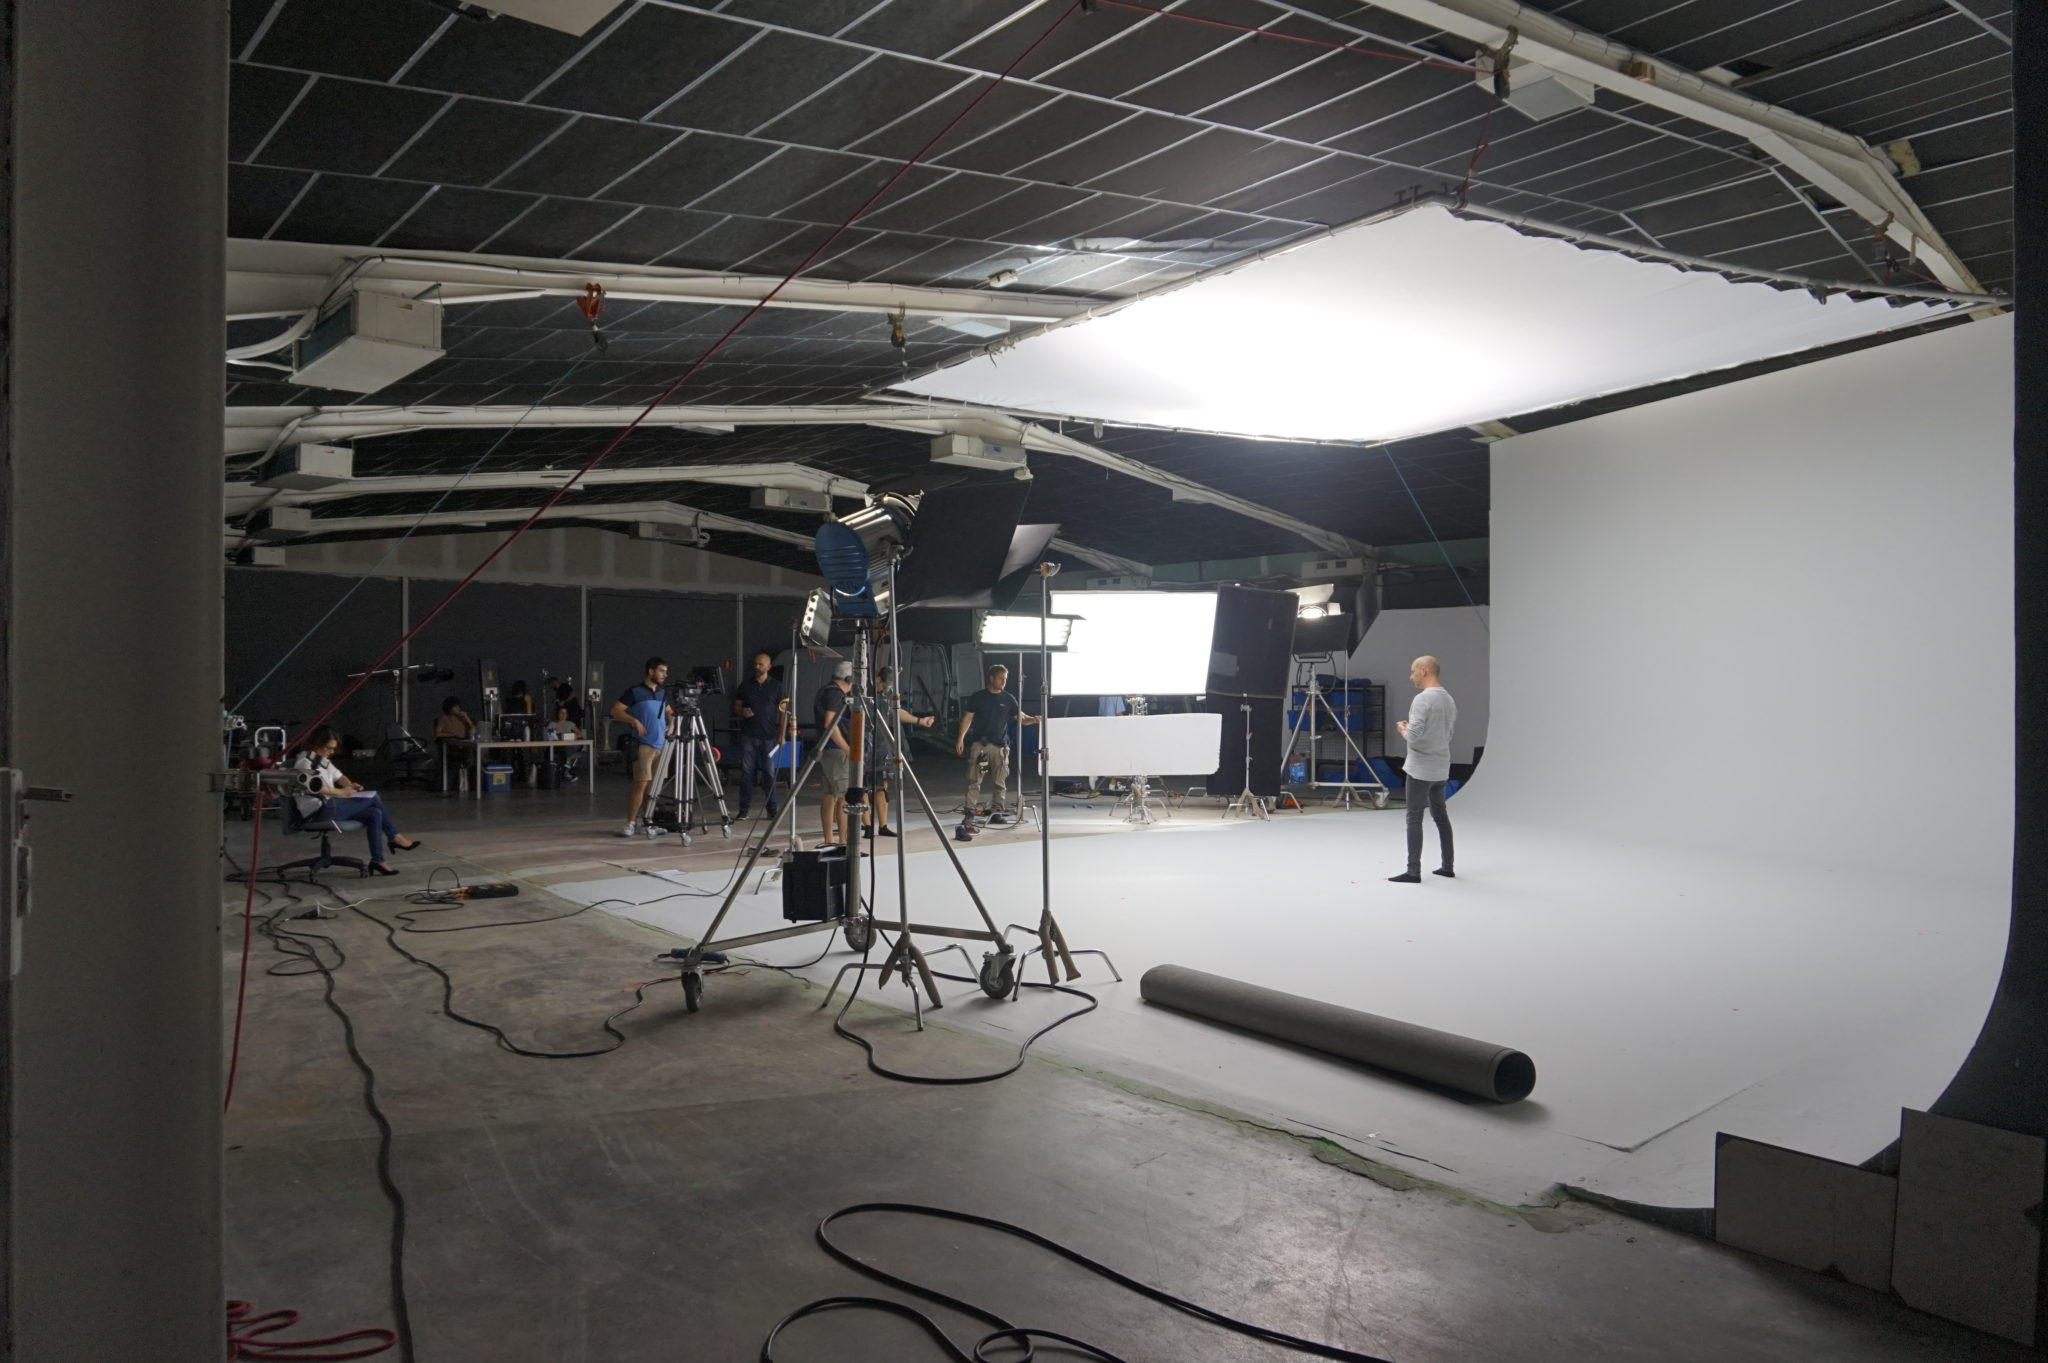 plató-audiovisual-ciclorama-ukpikproductions-valencia